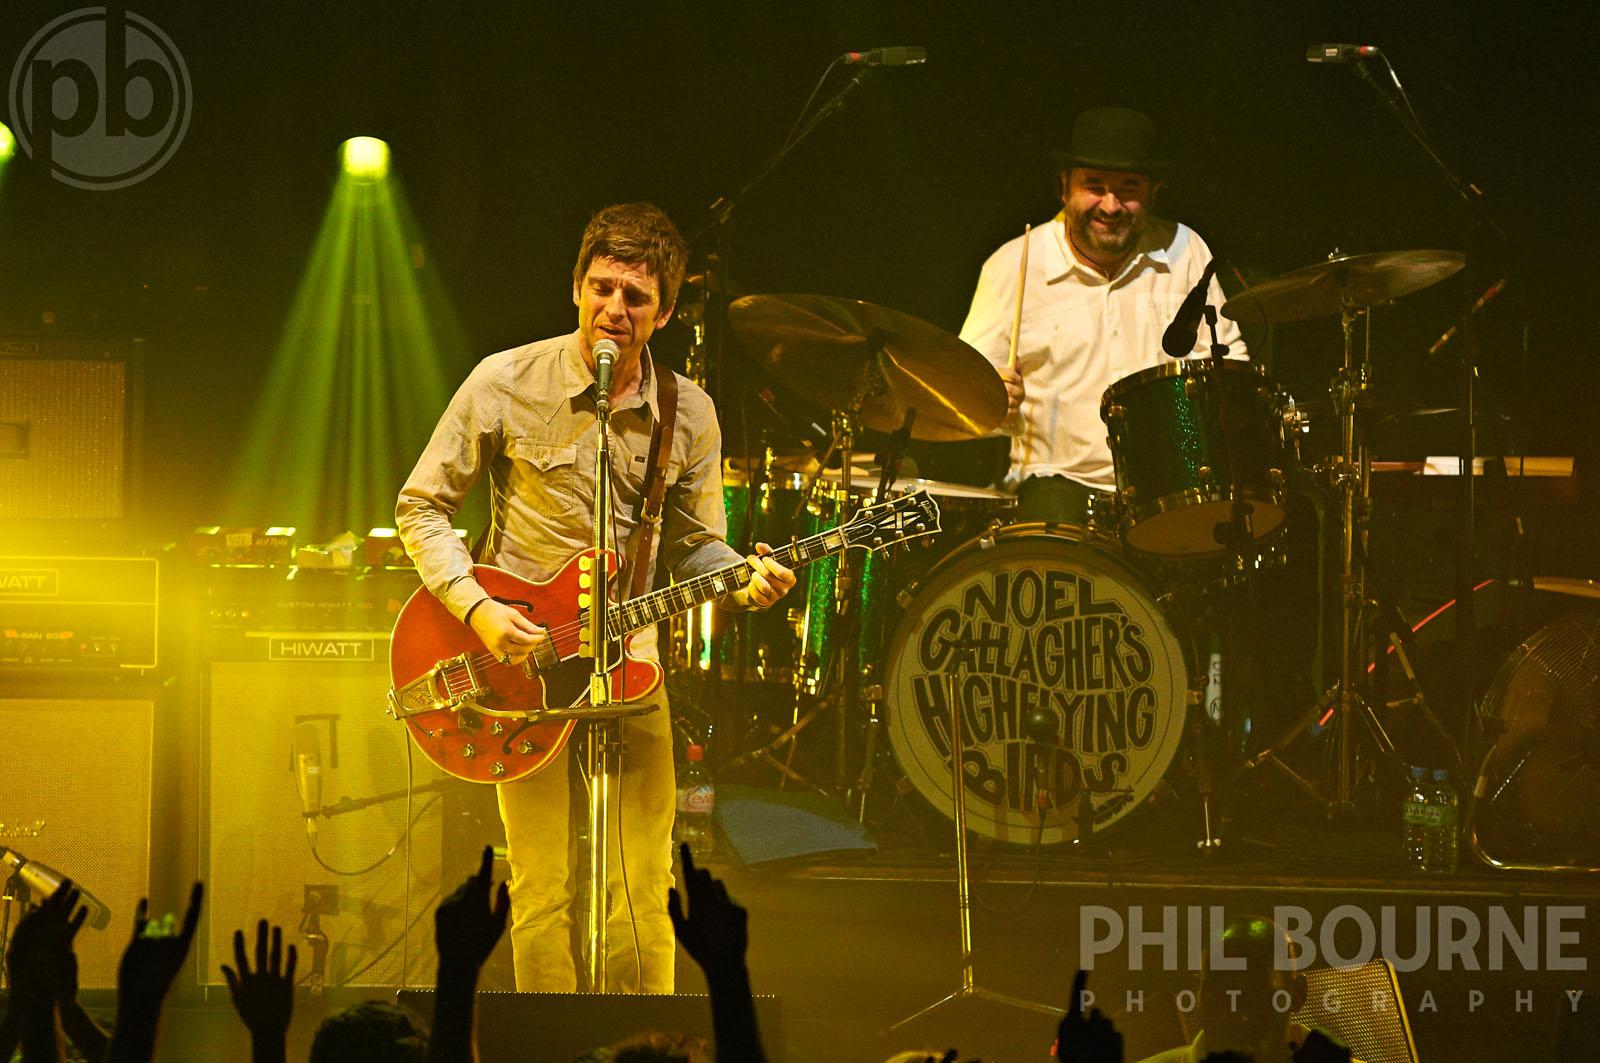 020_Live_Music_Photographer_London_Noel_Gallaghers_High_Flying_Birds_001.jpg